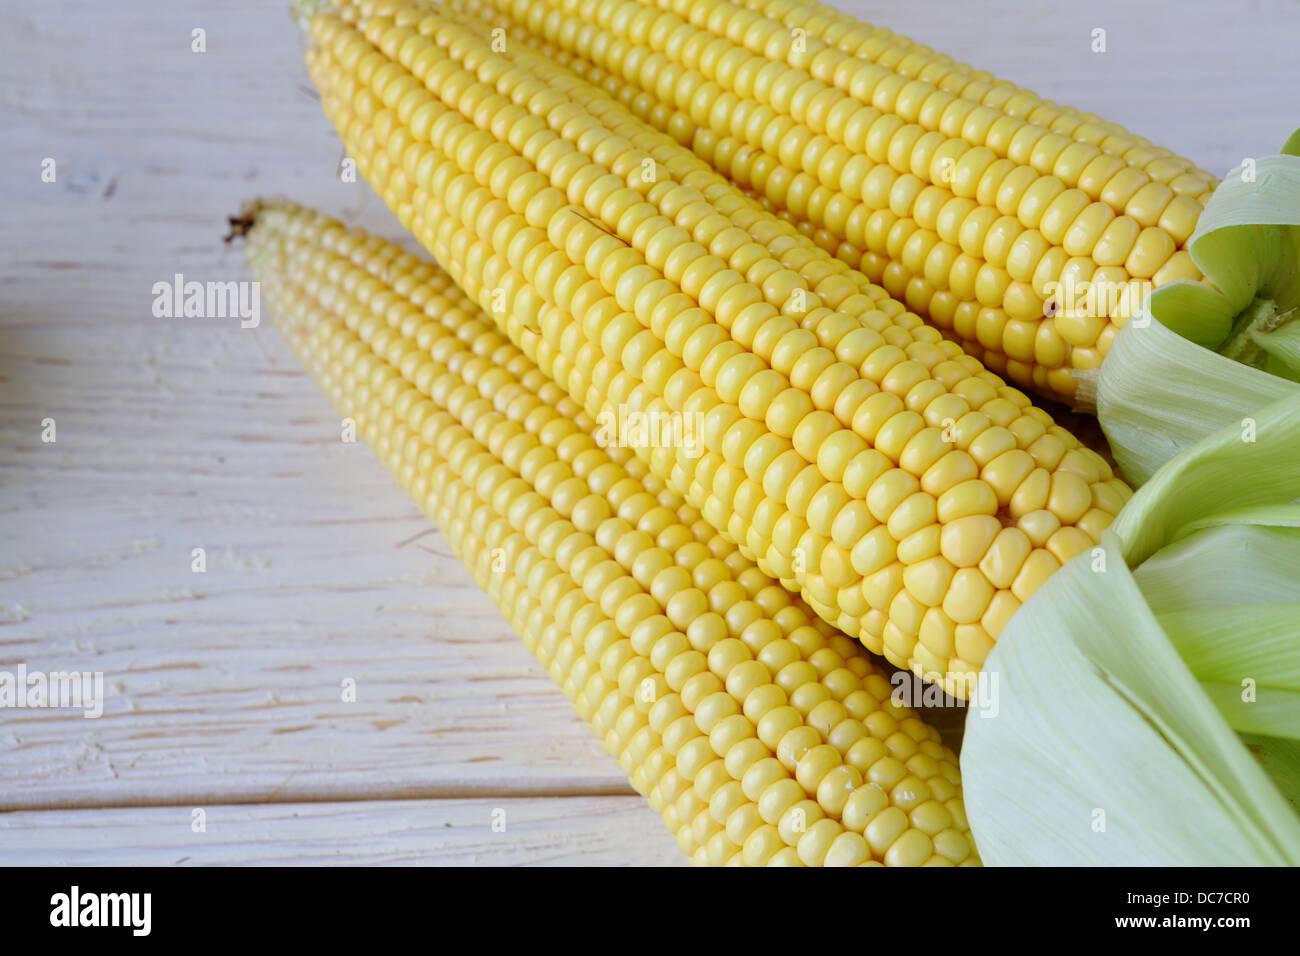 Three fresh corn cobs on the table, food - Stock Image